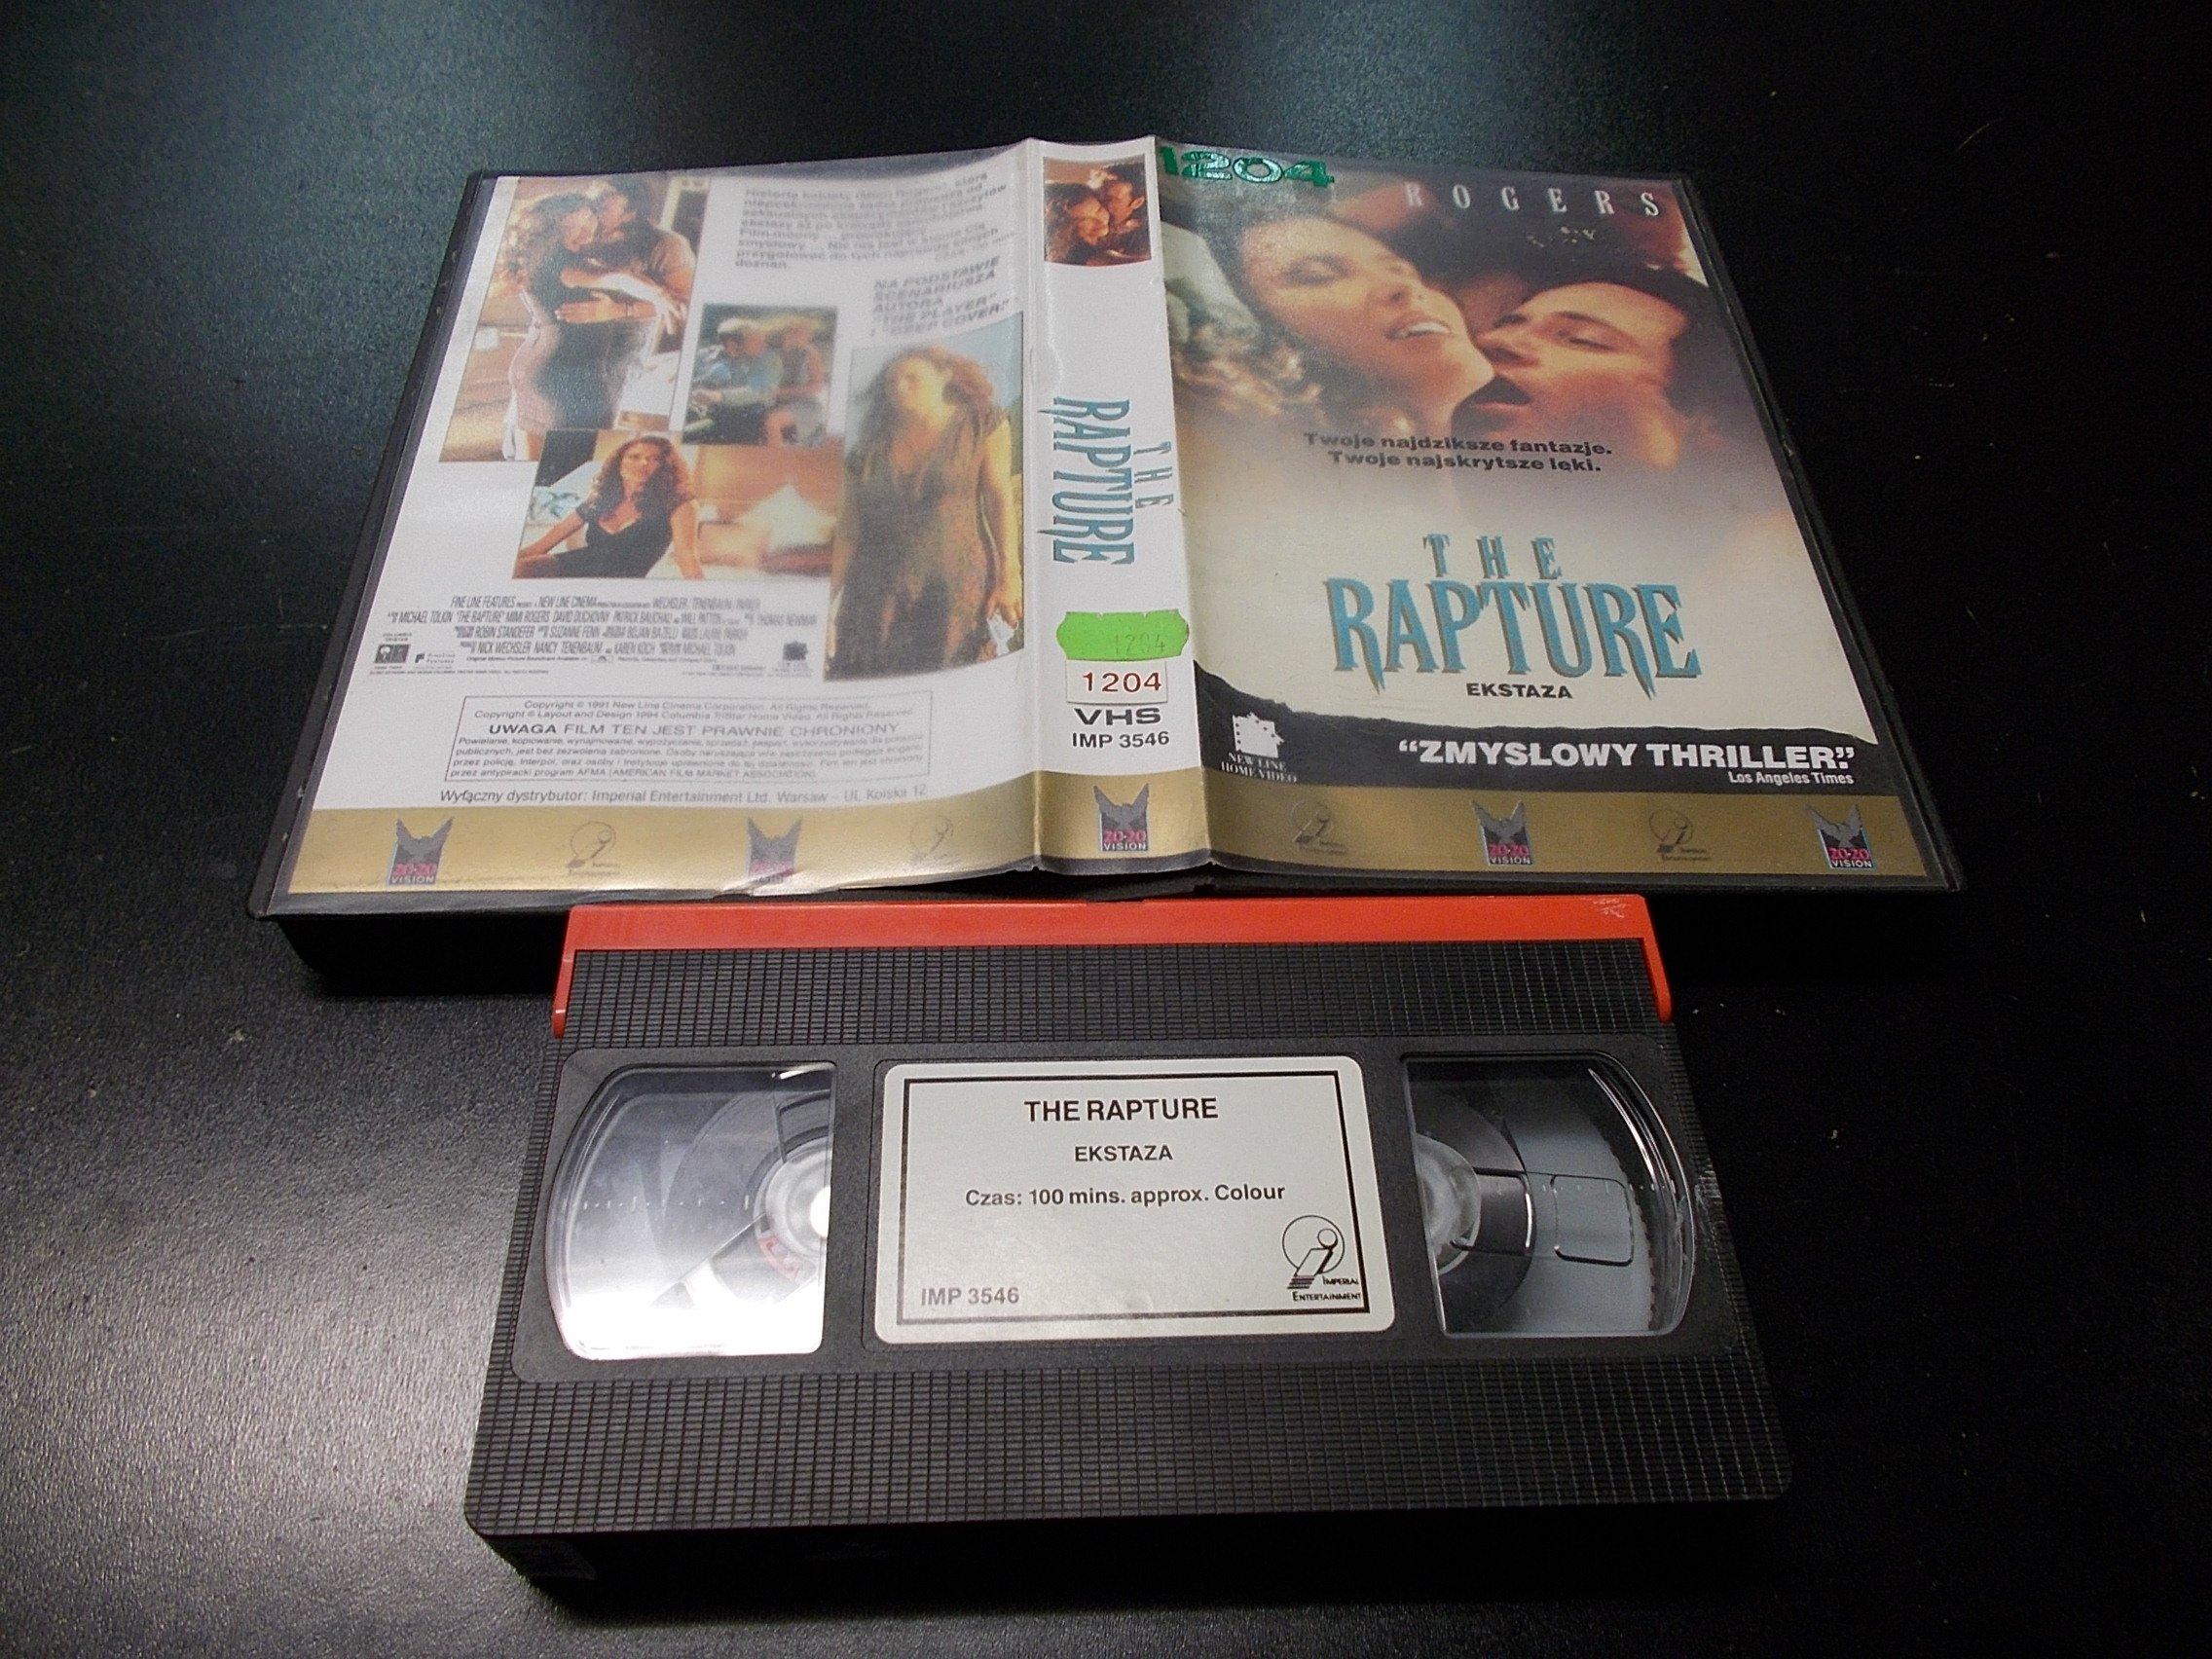 EKSTAZA -  kaseta VHS - 1197 Opole - AlleOpole.pl